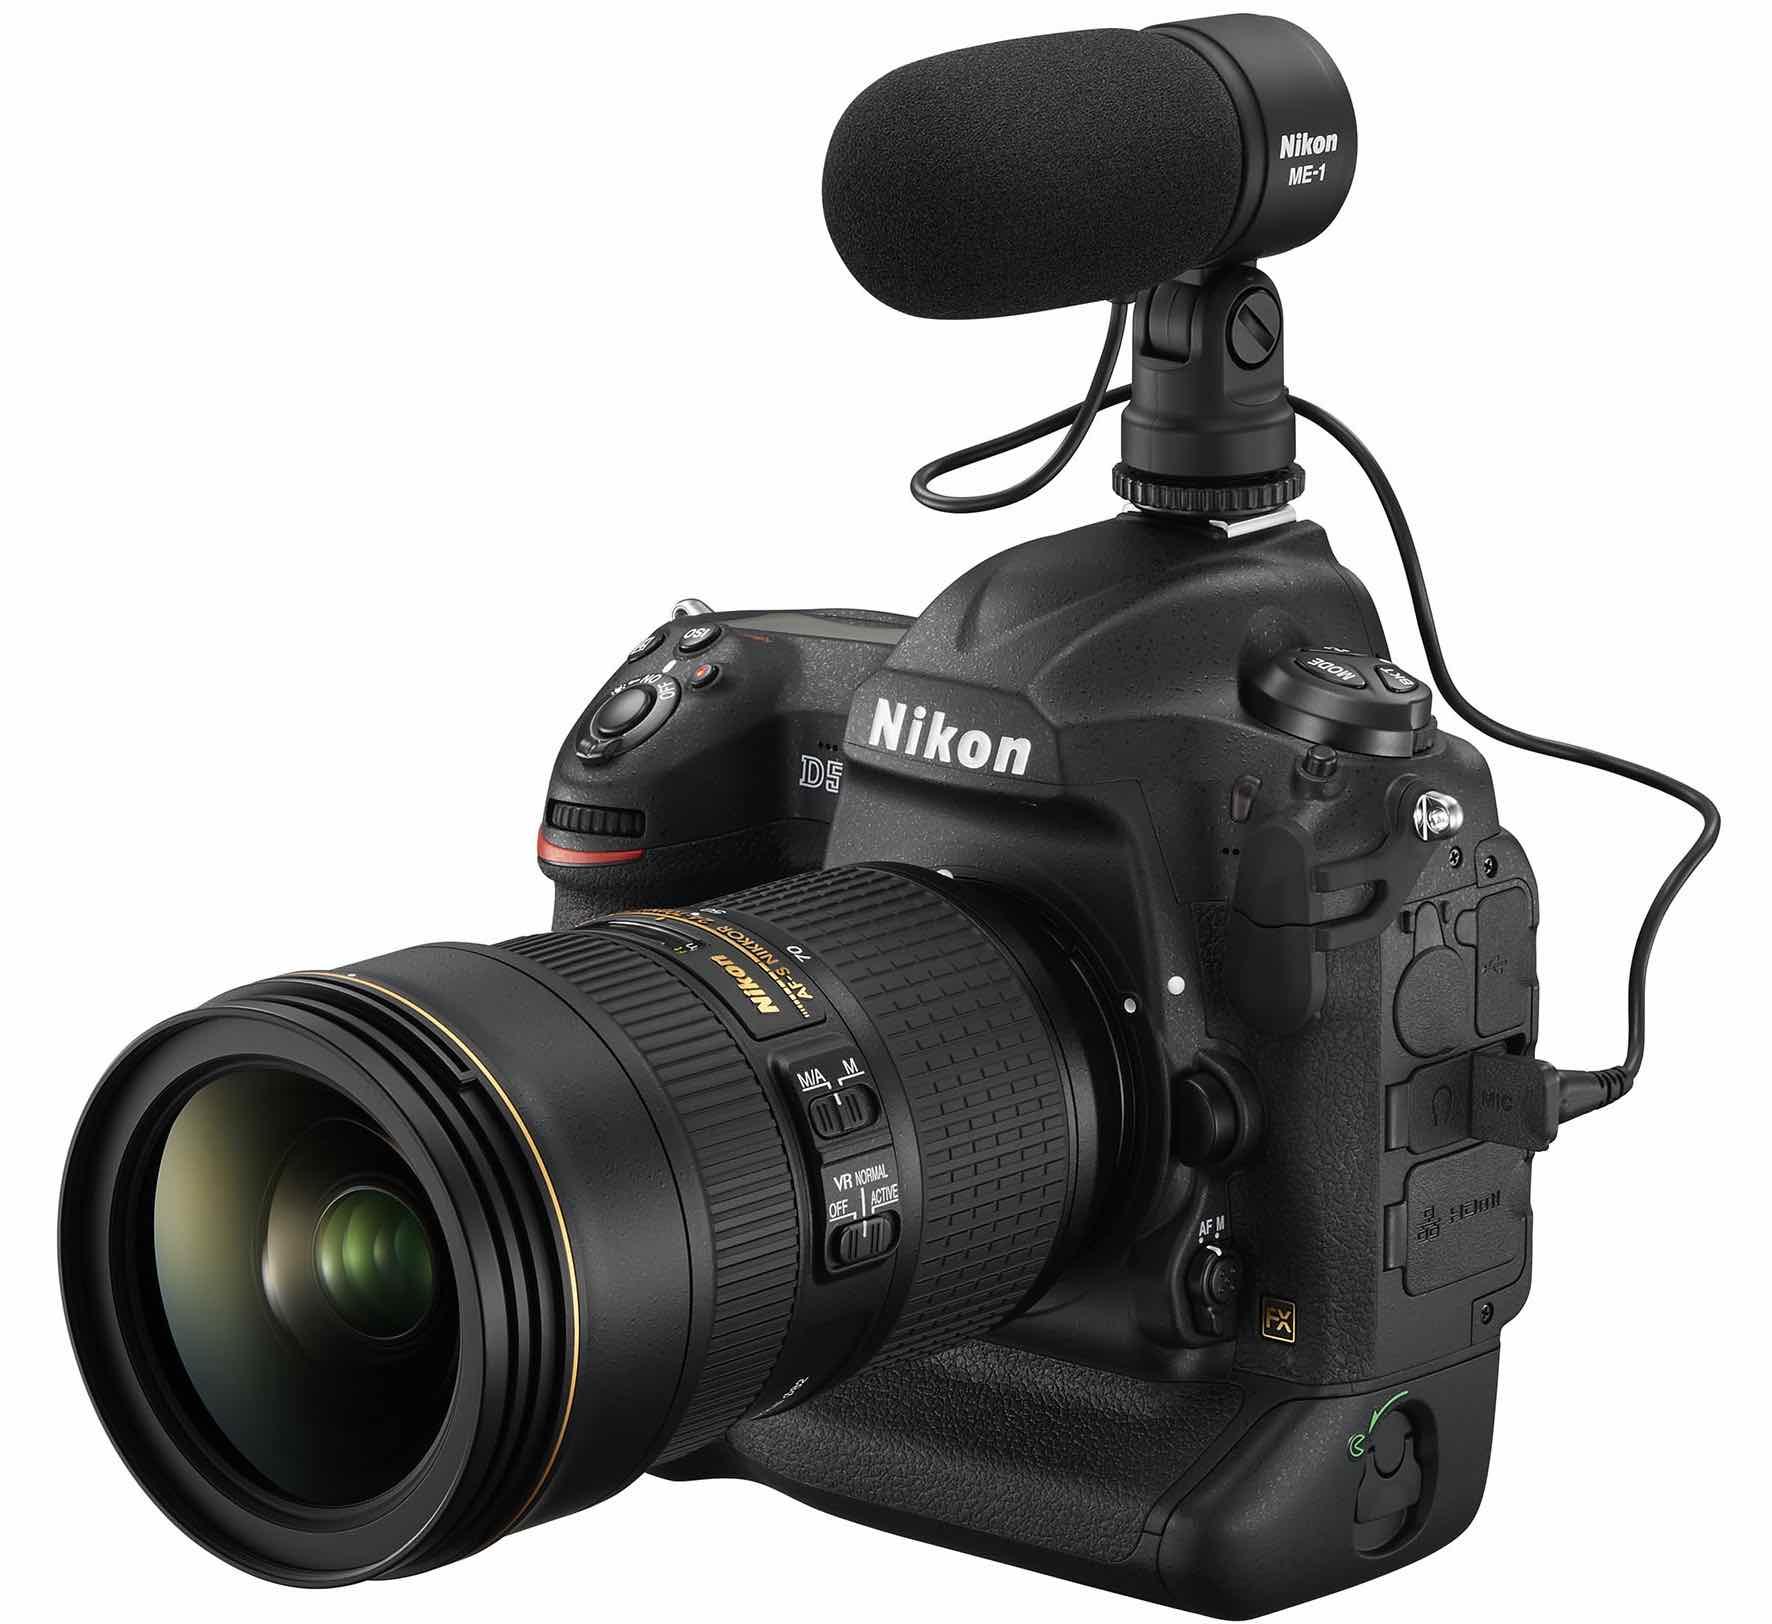 Nikon D5 for video